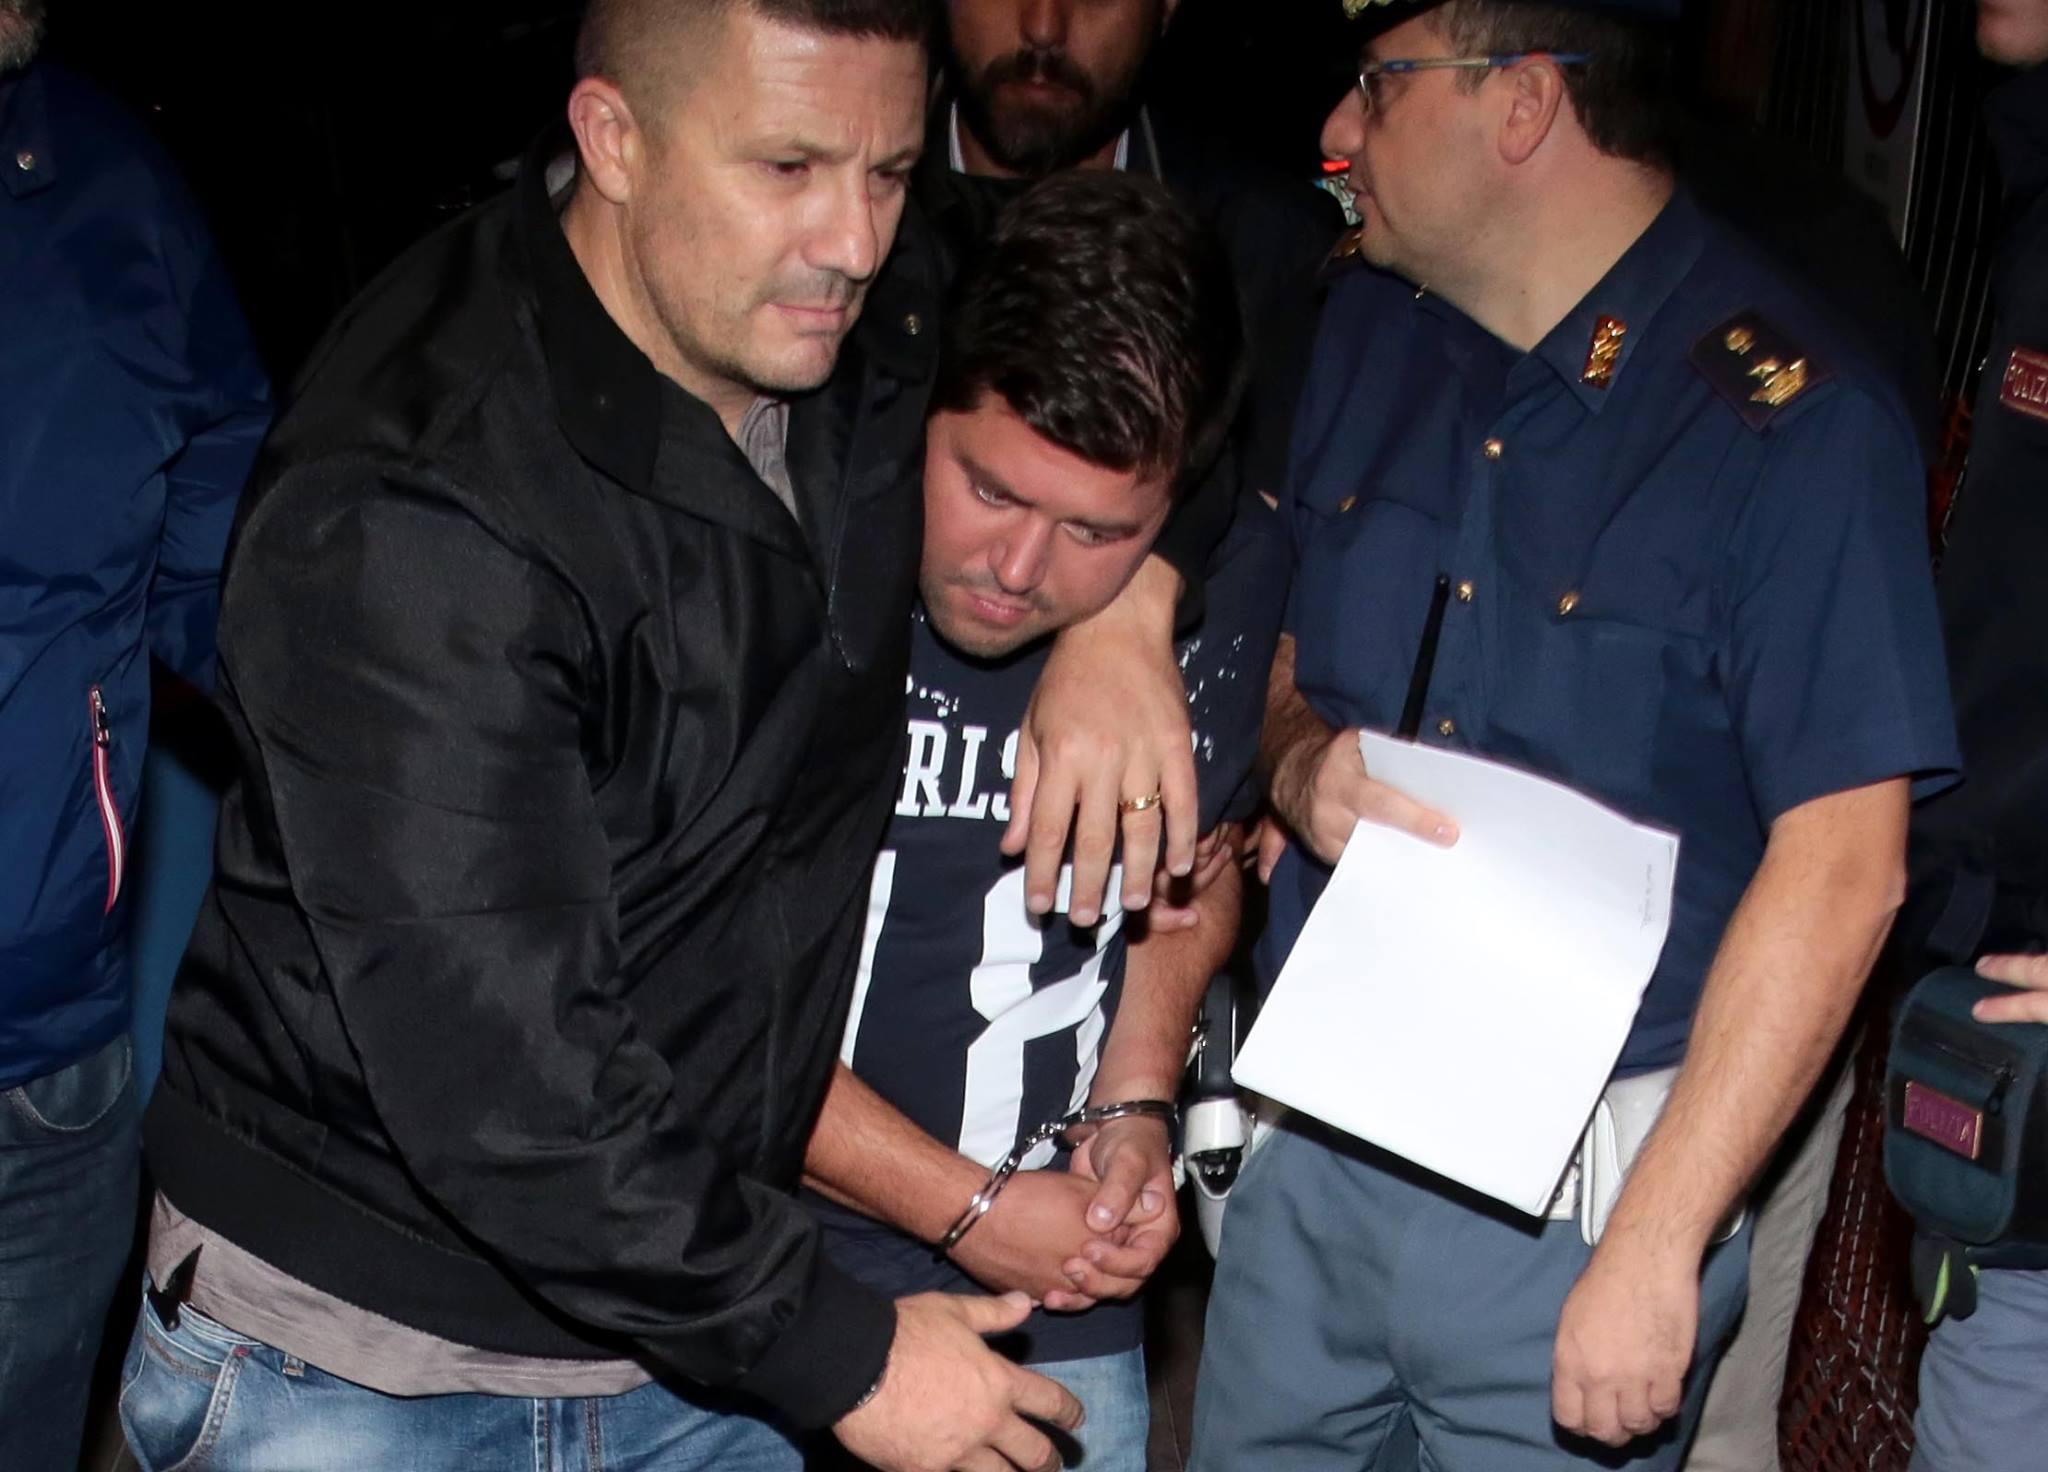 Arrestato Raffele Rende sparatoria fuorigrotta